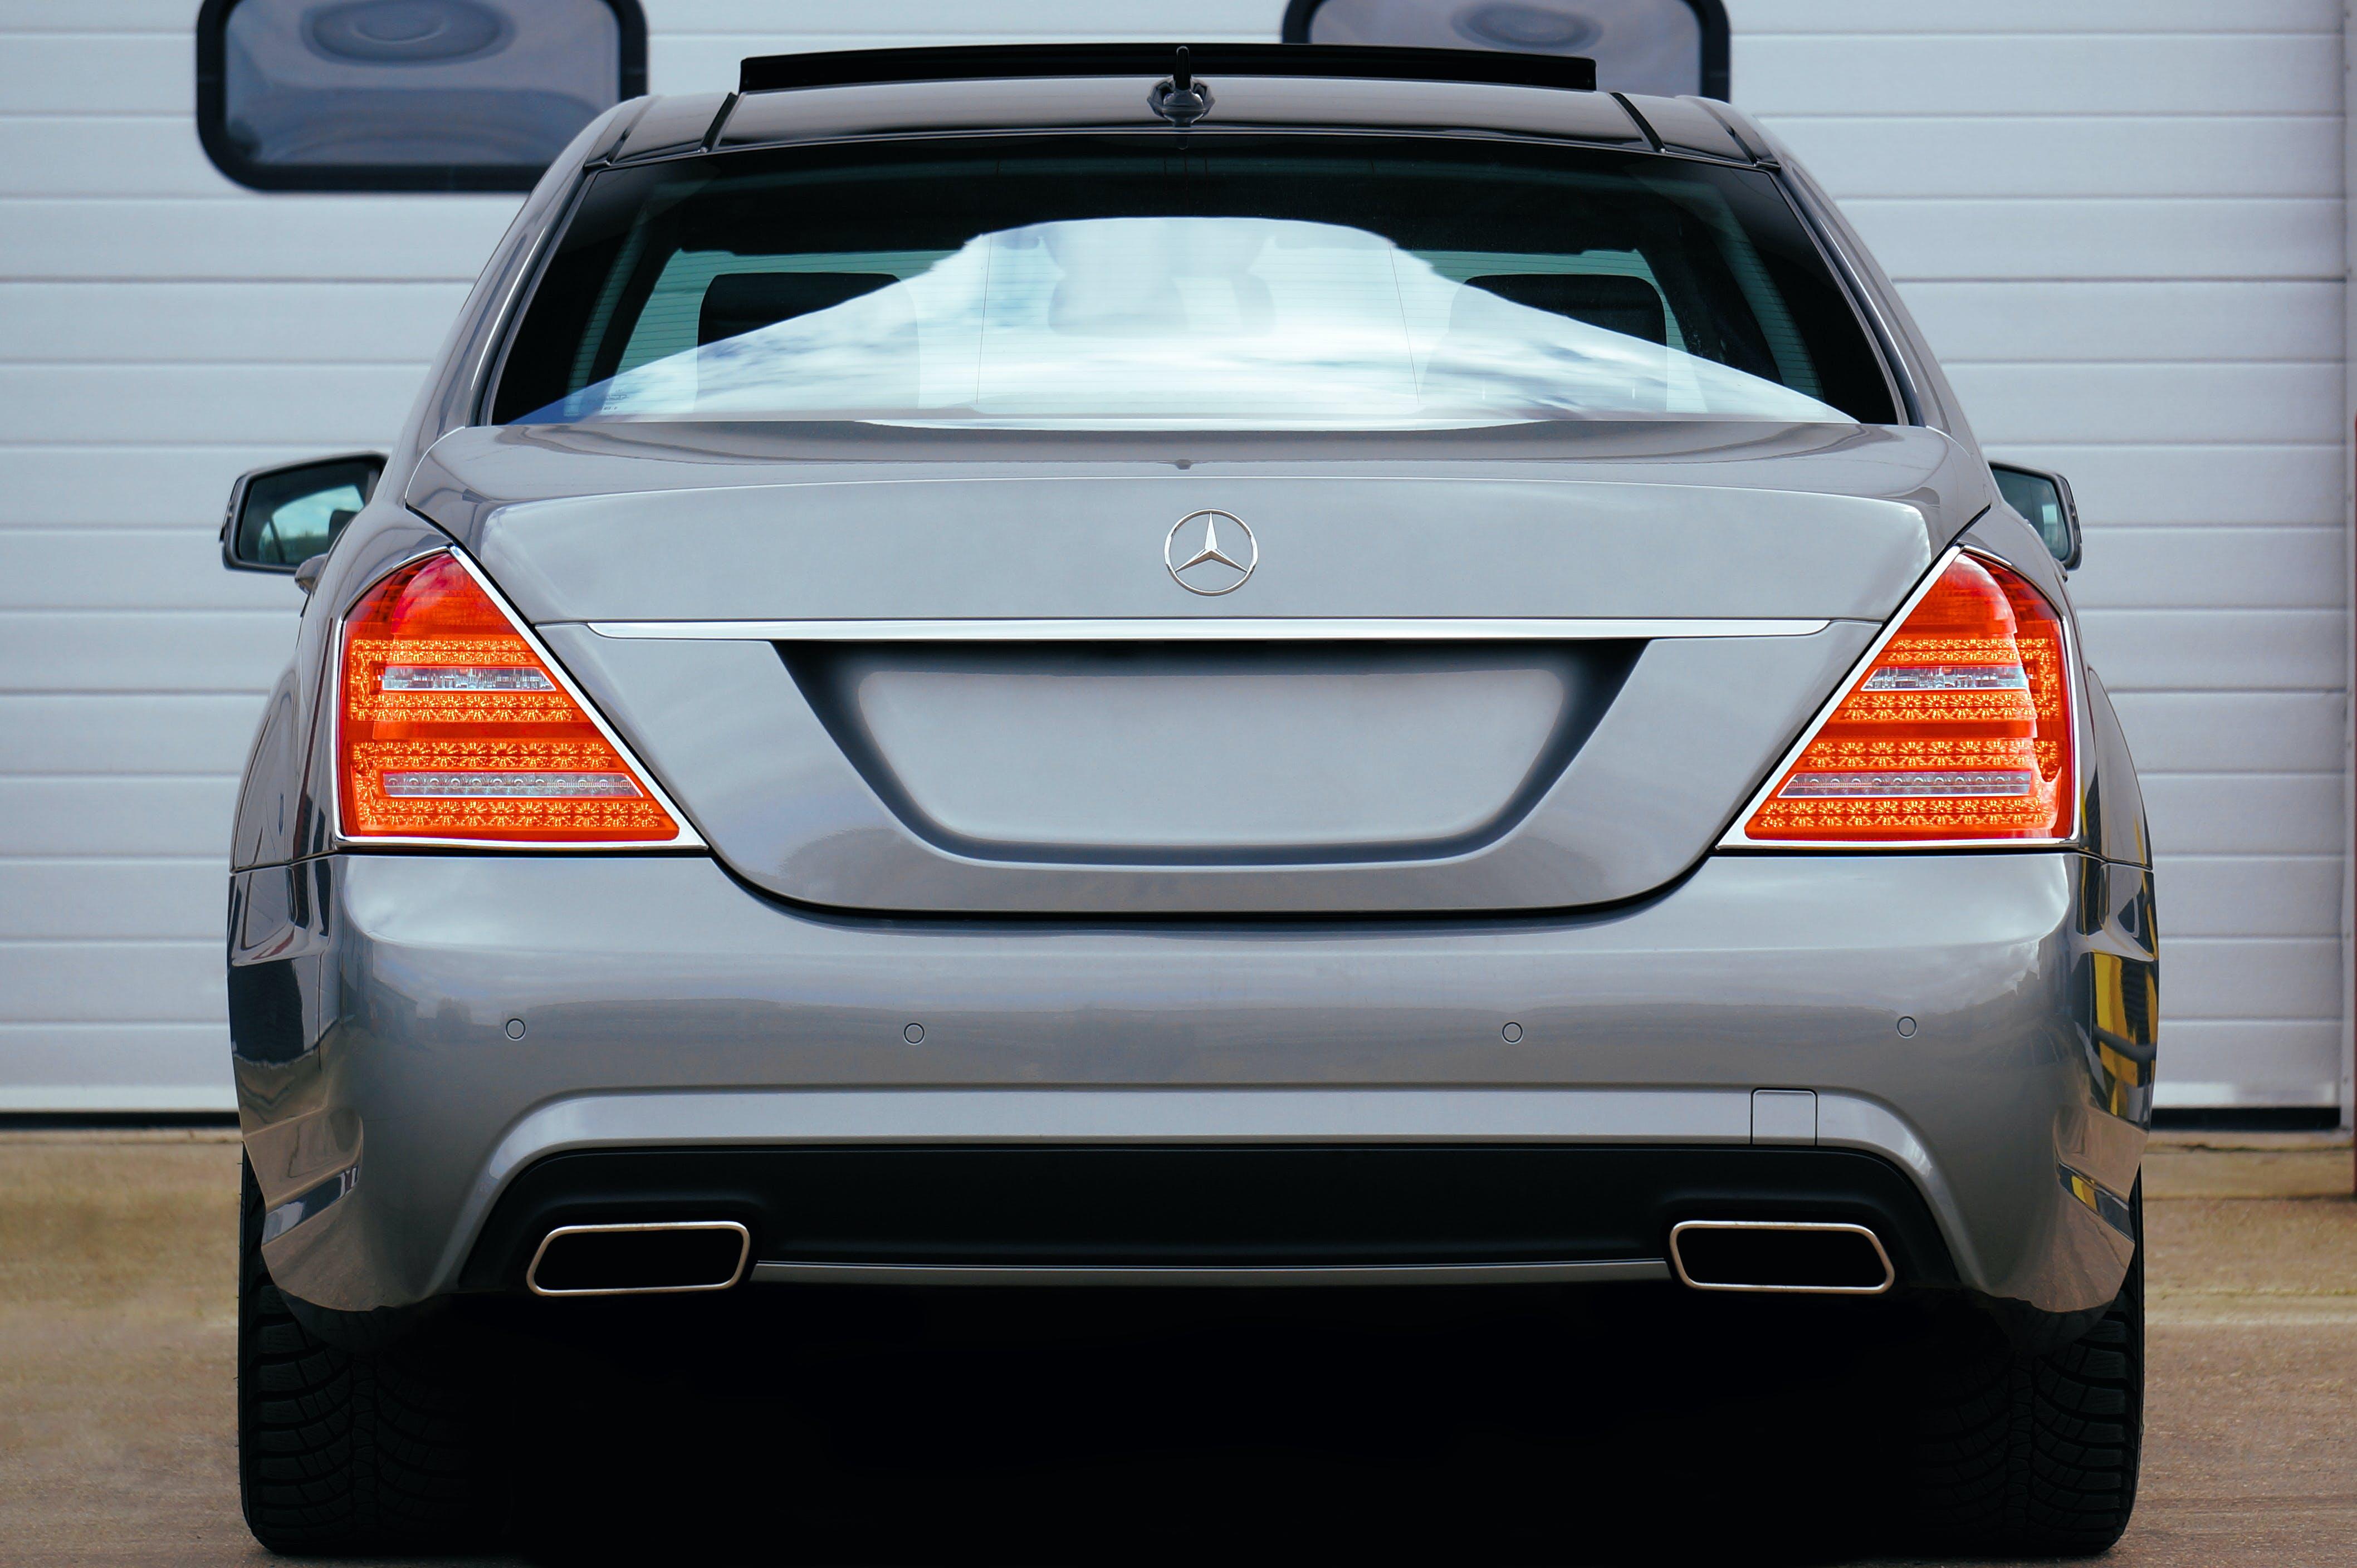 Gray Mercedes-benz Suv